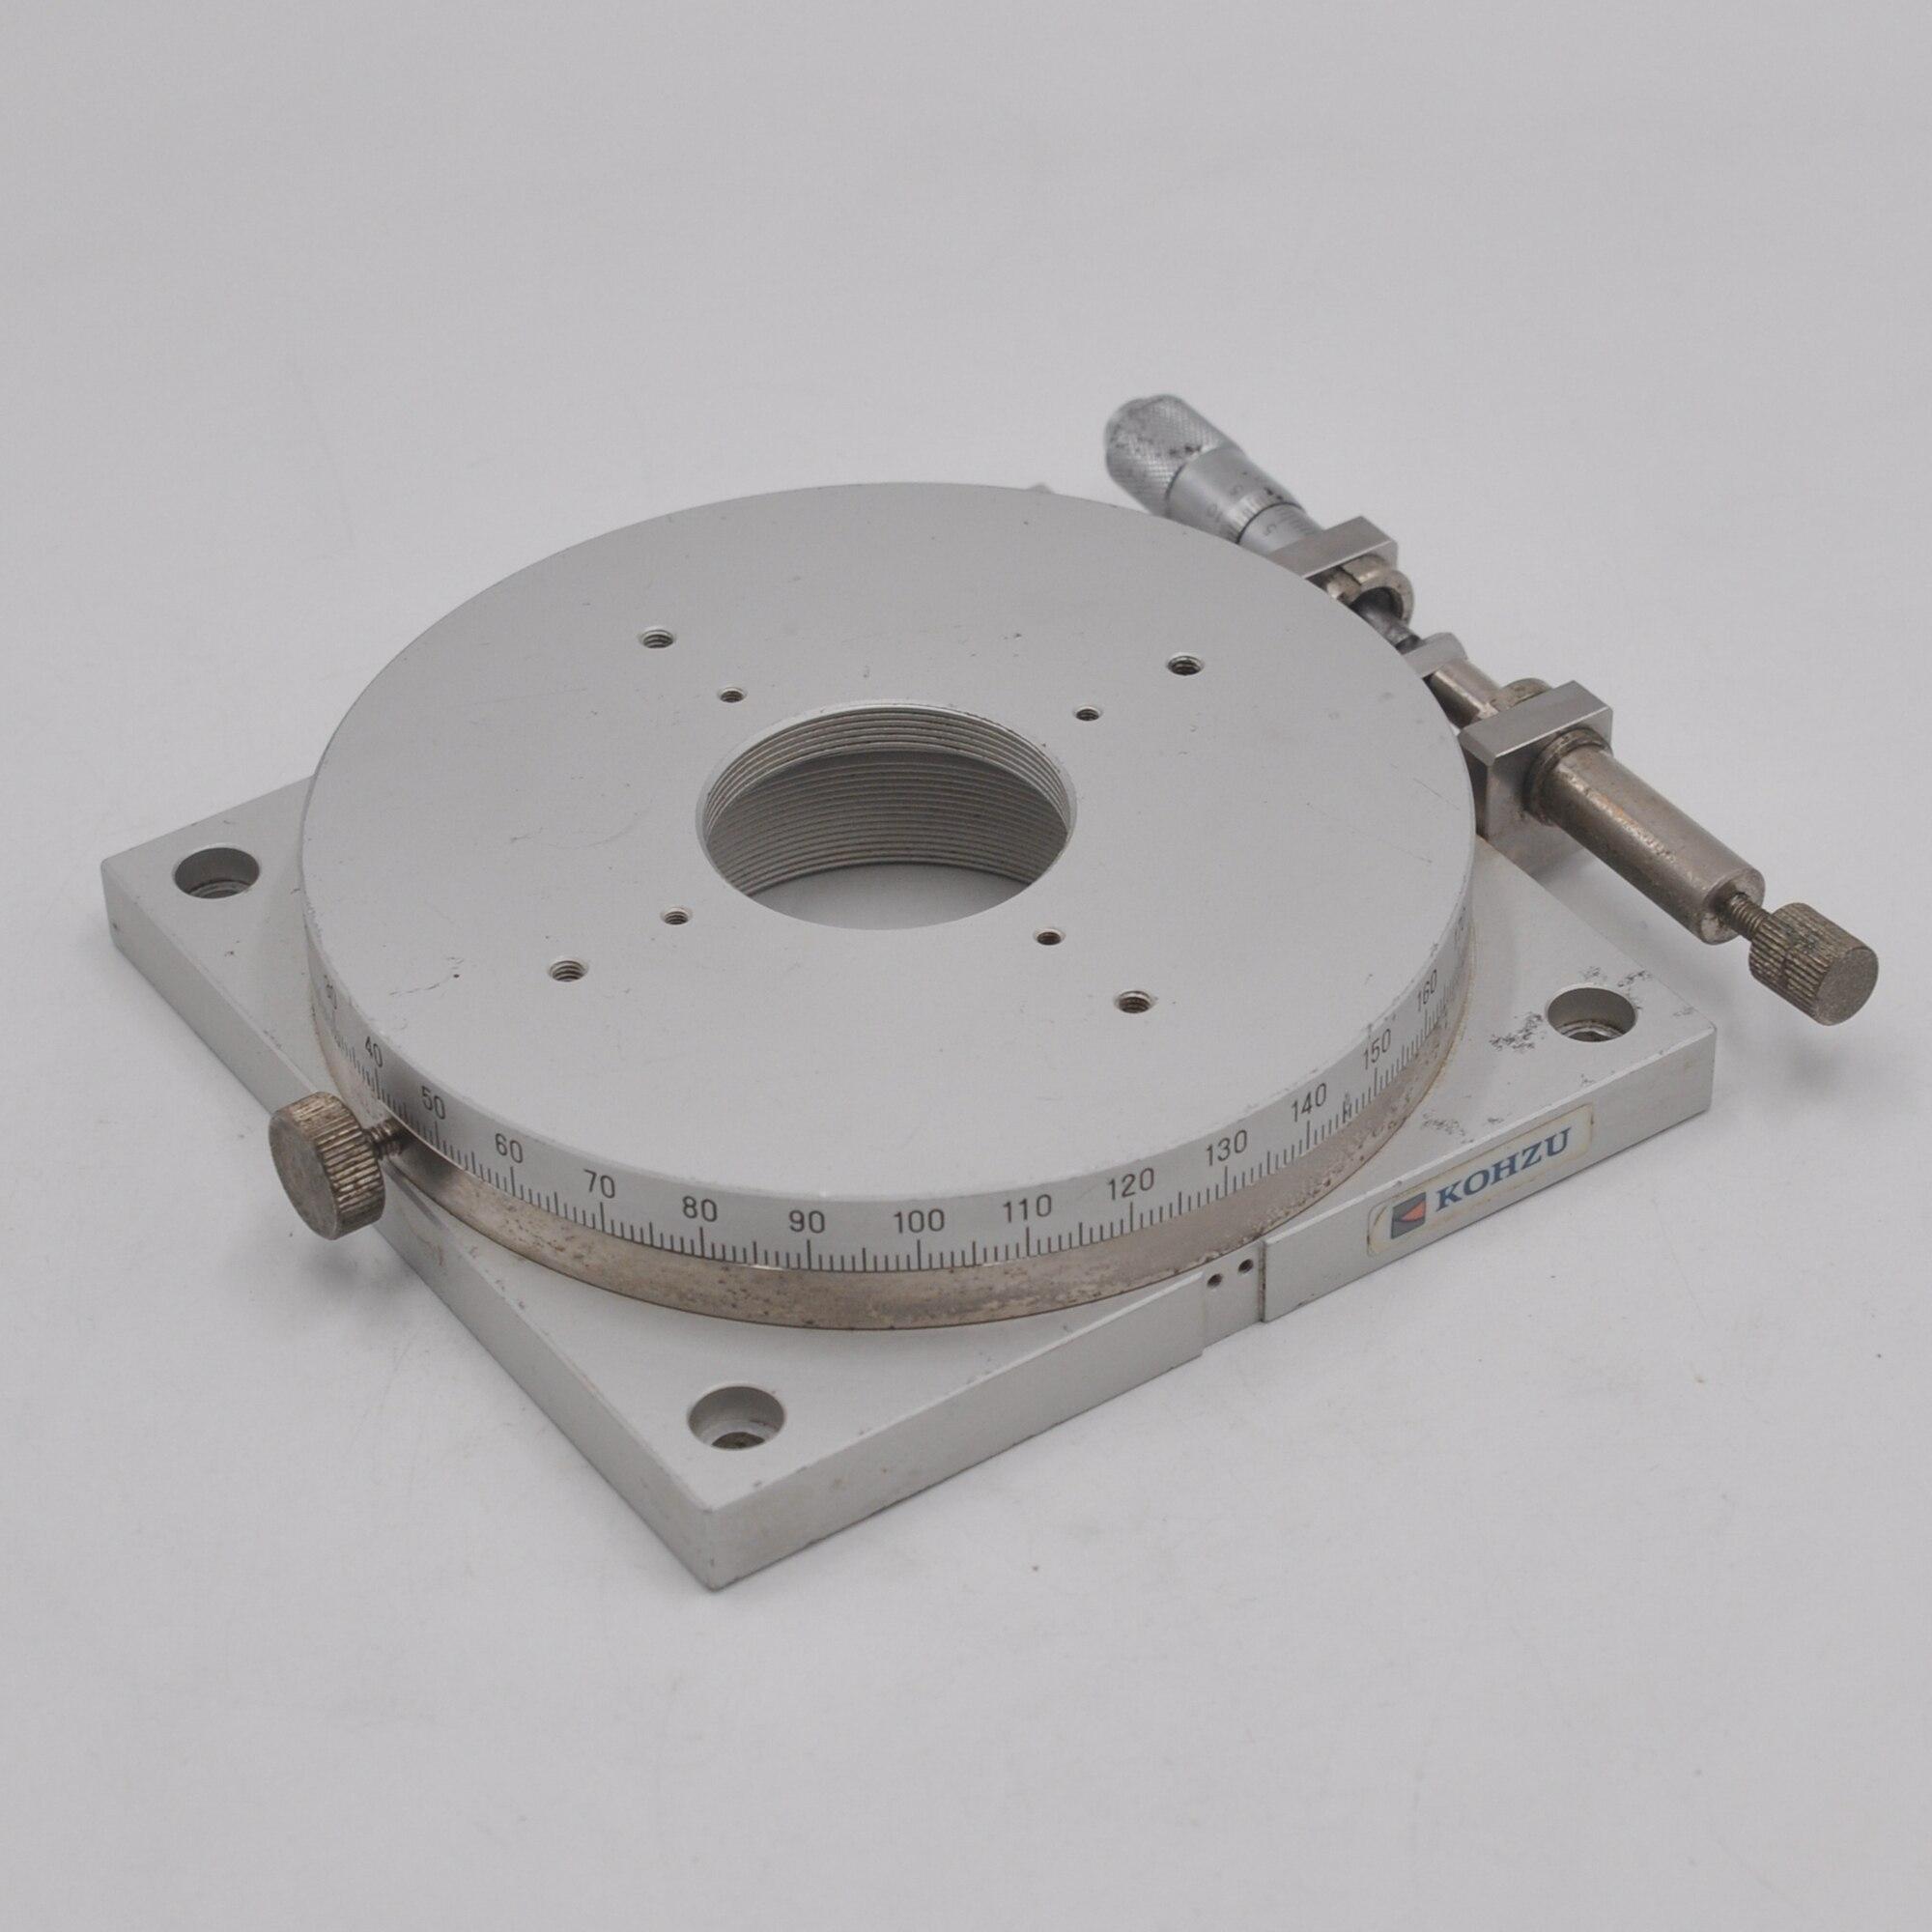 Japan KOHZU RM13A-C1 ultra-precision fine-tuning rotating 360 ° slide aluminum alloy